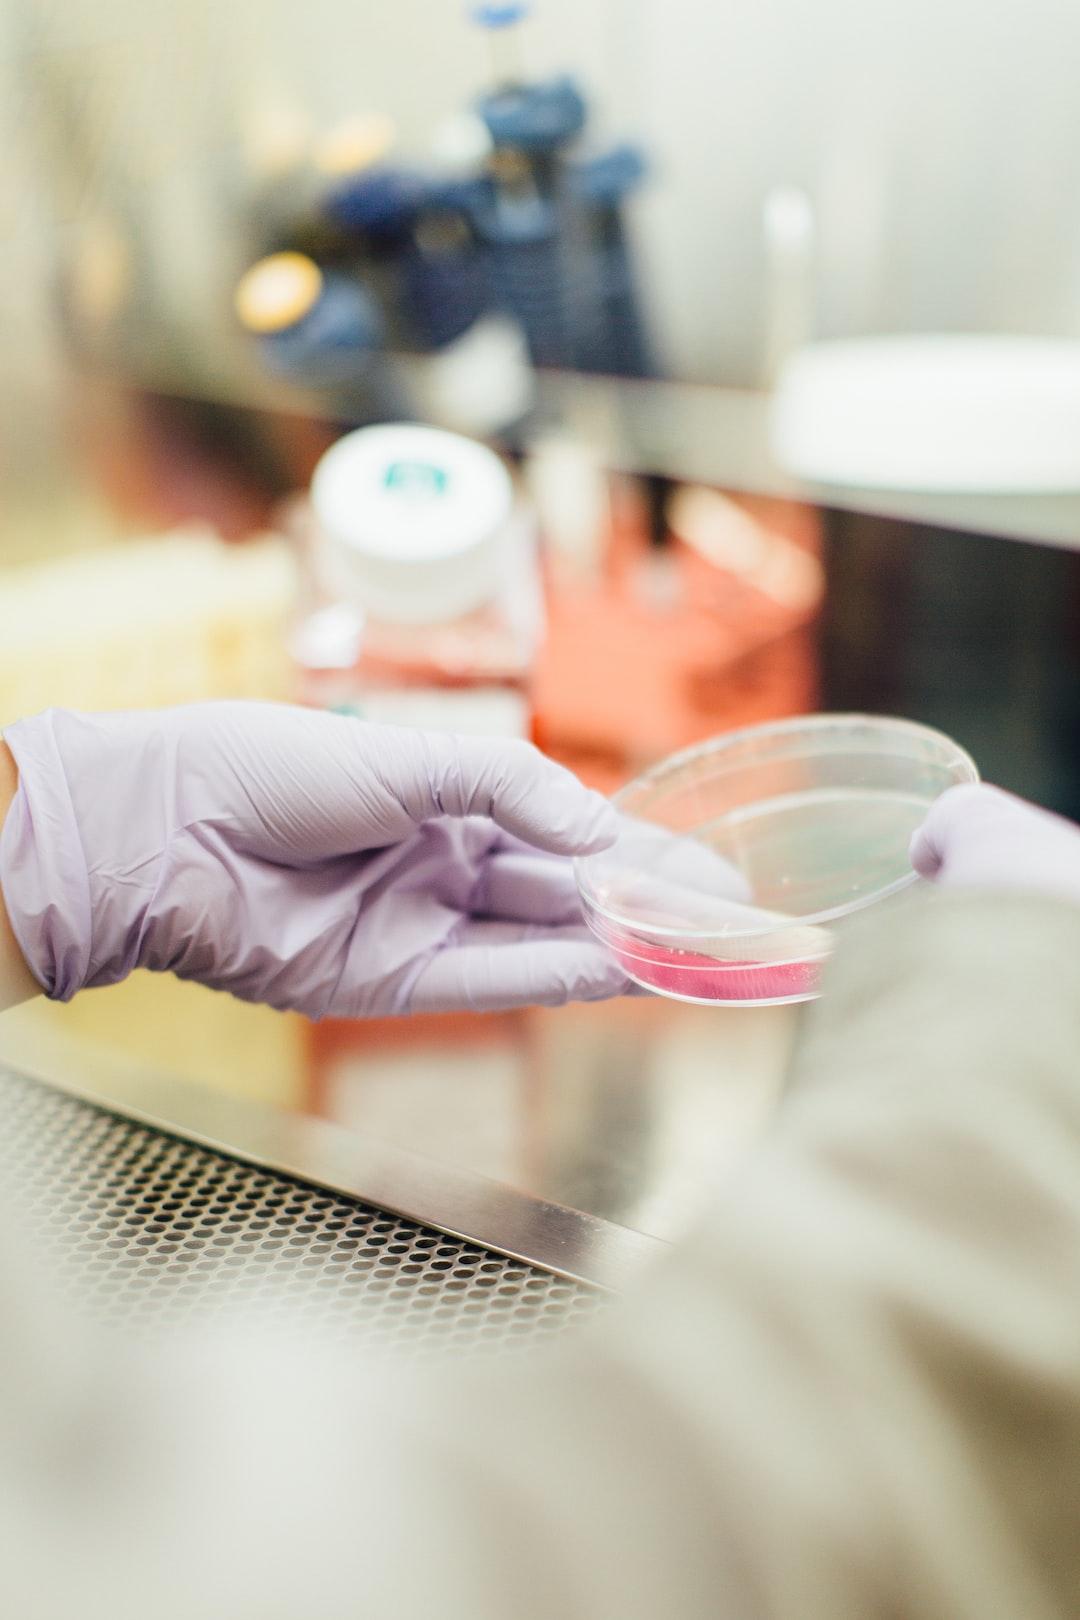 Scientist with a Petri dish